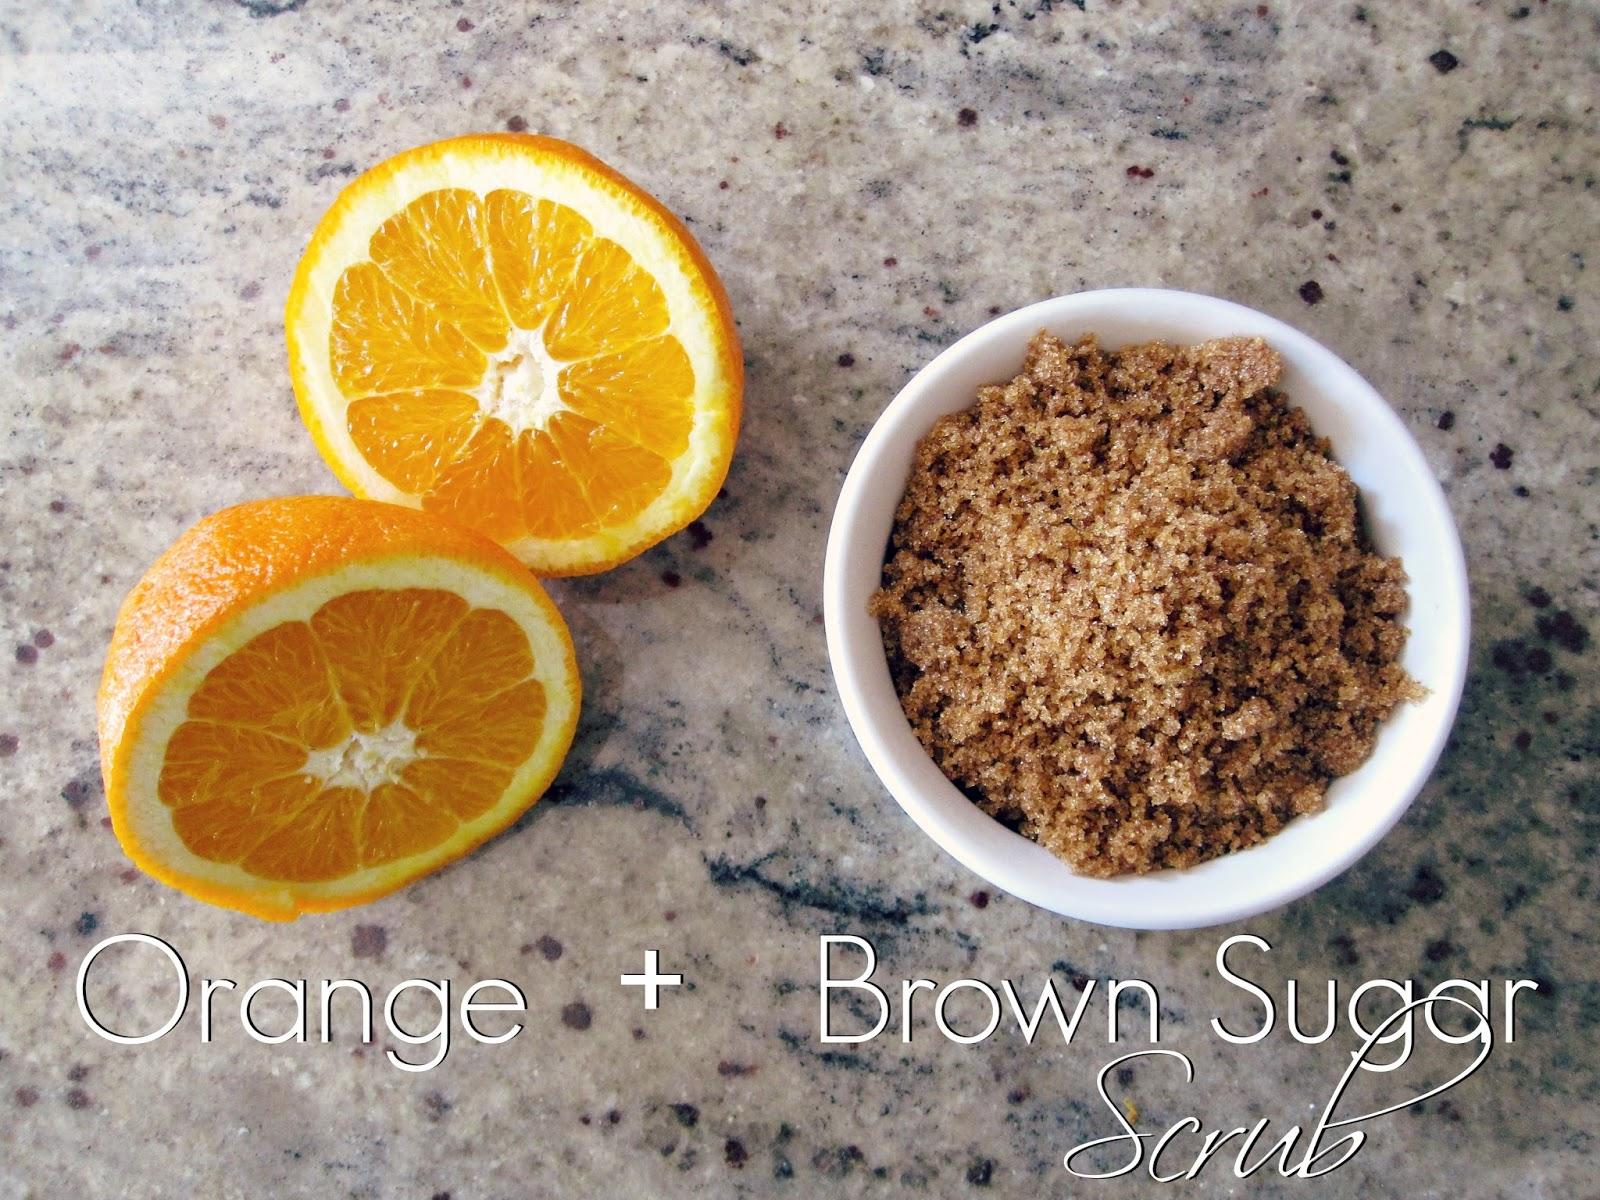 DIY Orange and Brown Sugar Scrub